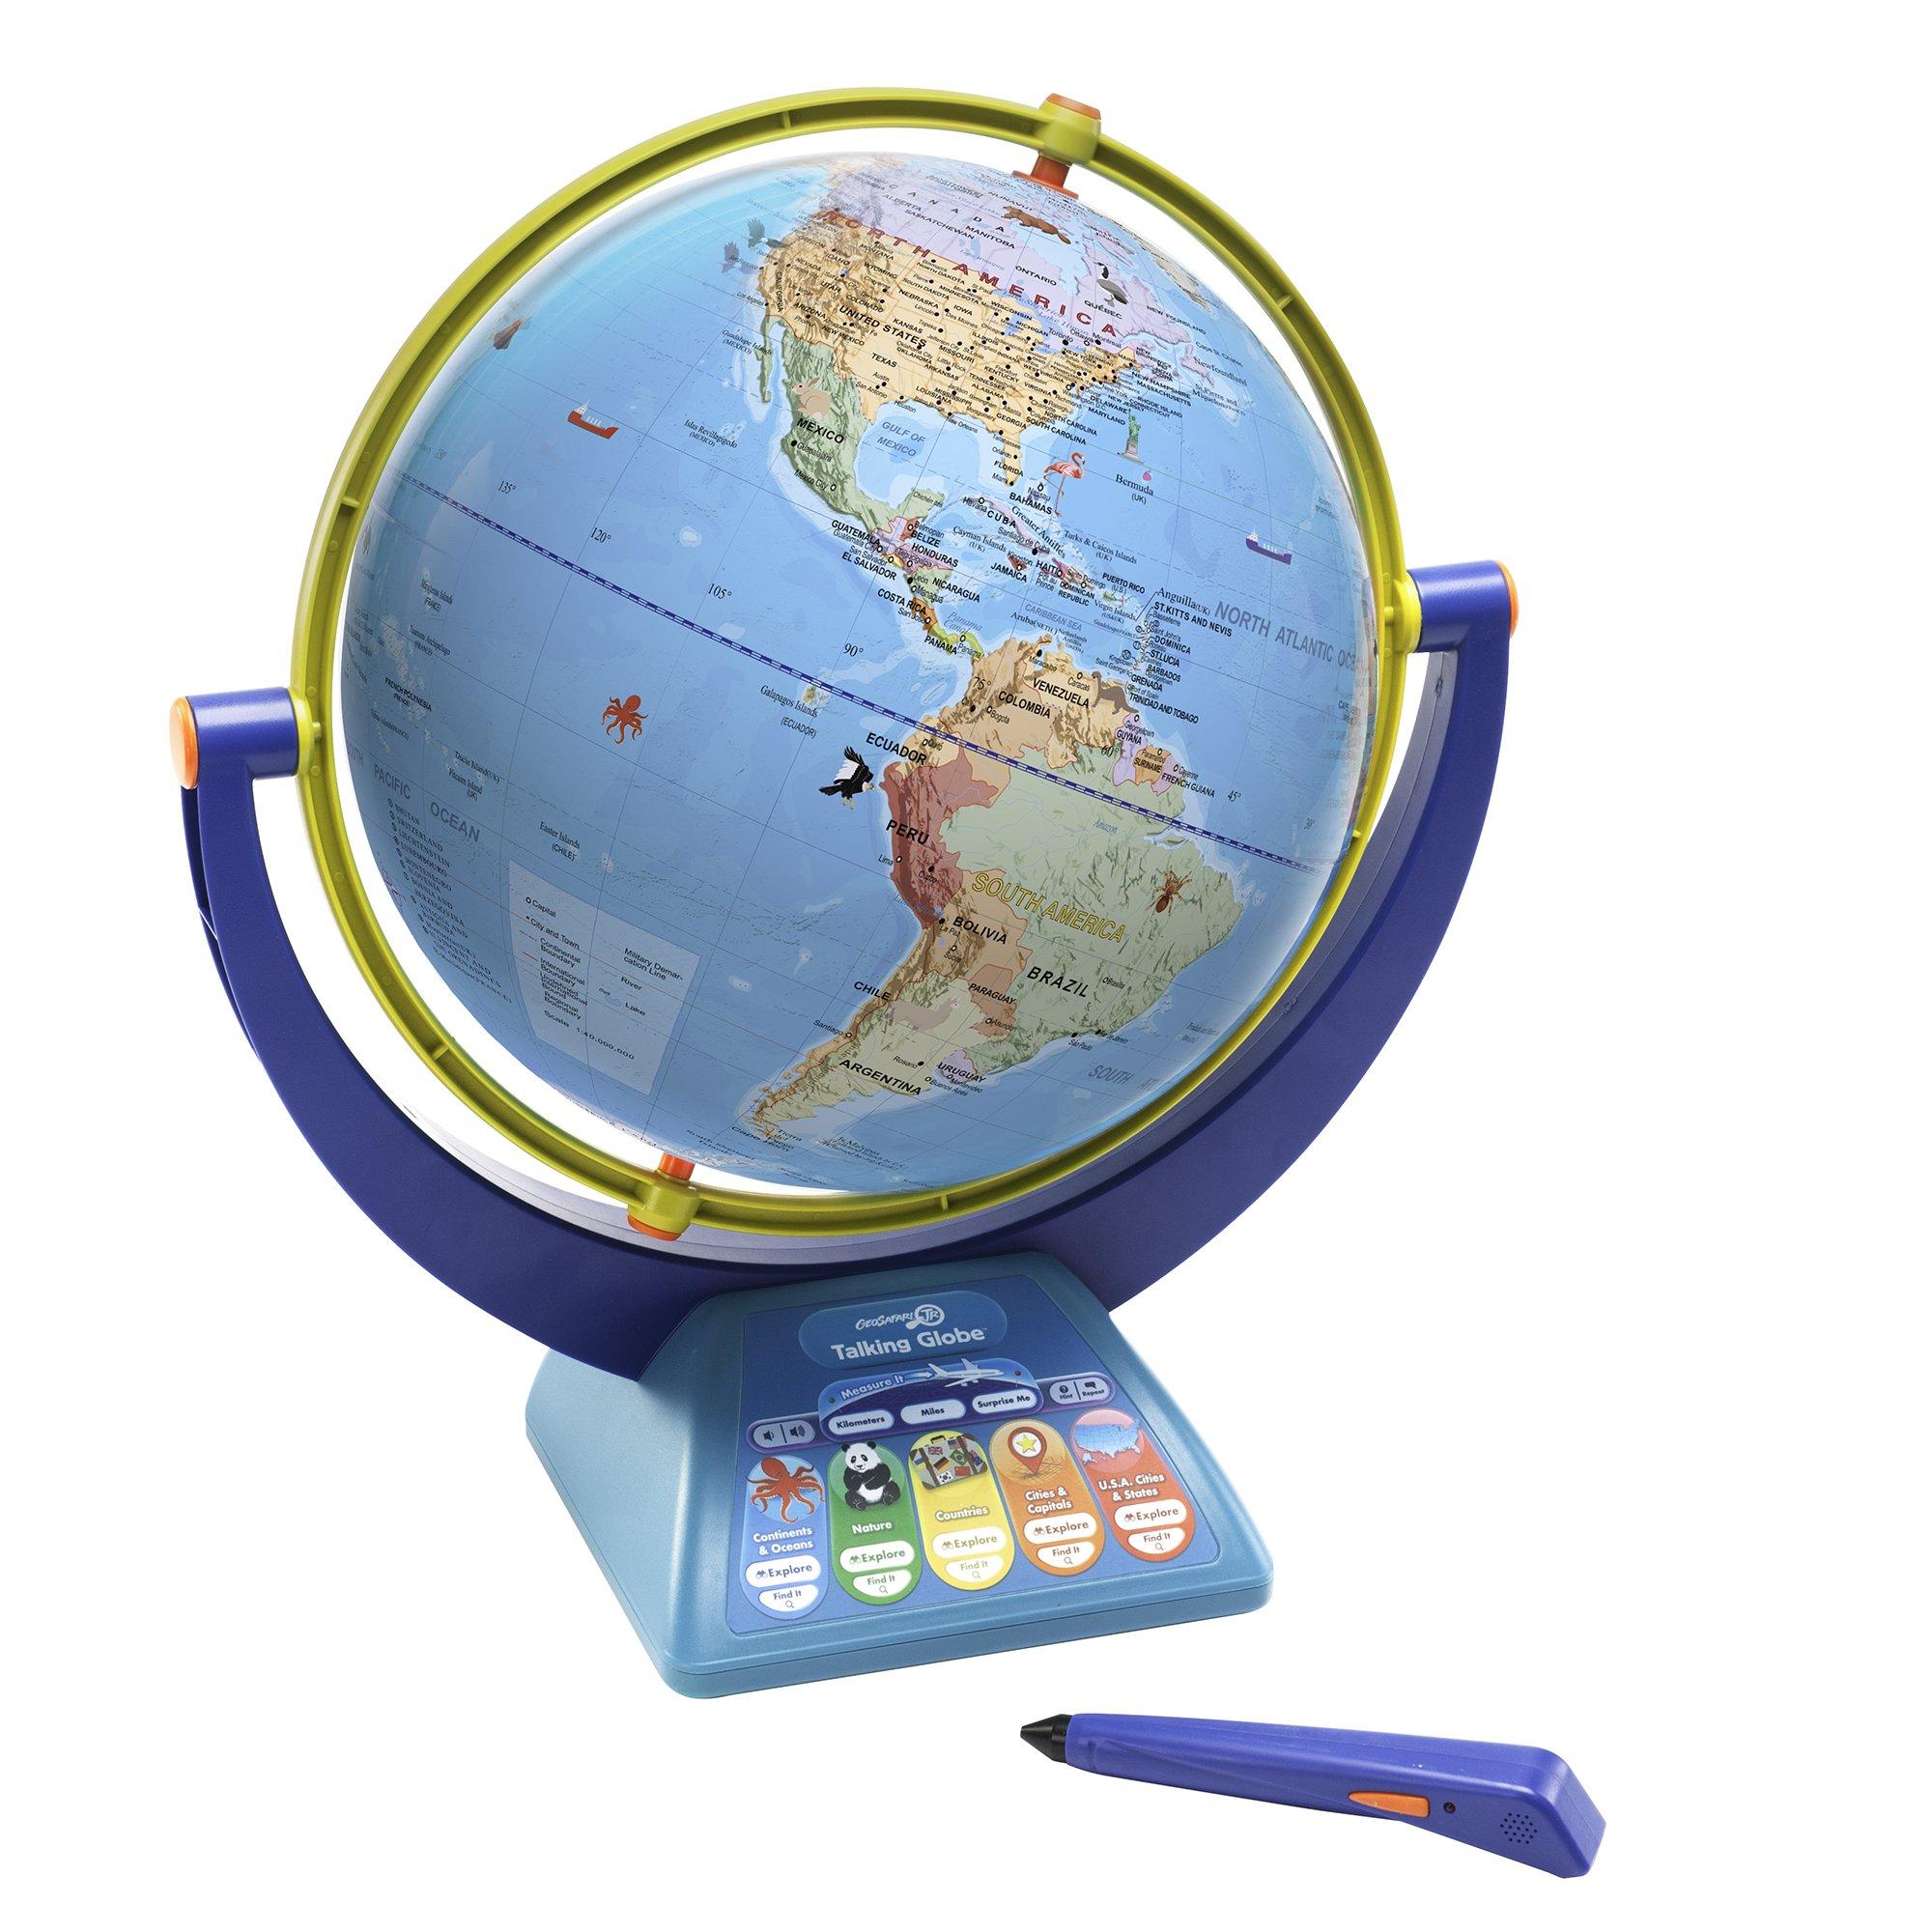 Educational Insights Geosafari Jr. Talking Globe-Featuring Bindi Irwin-Learning Toy